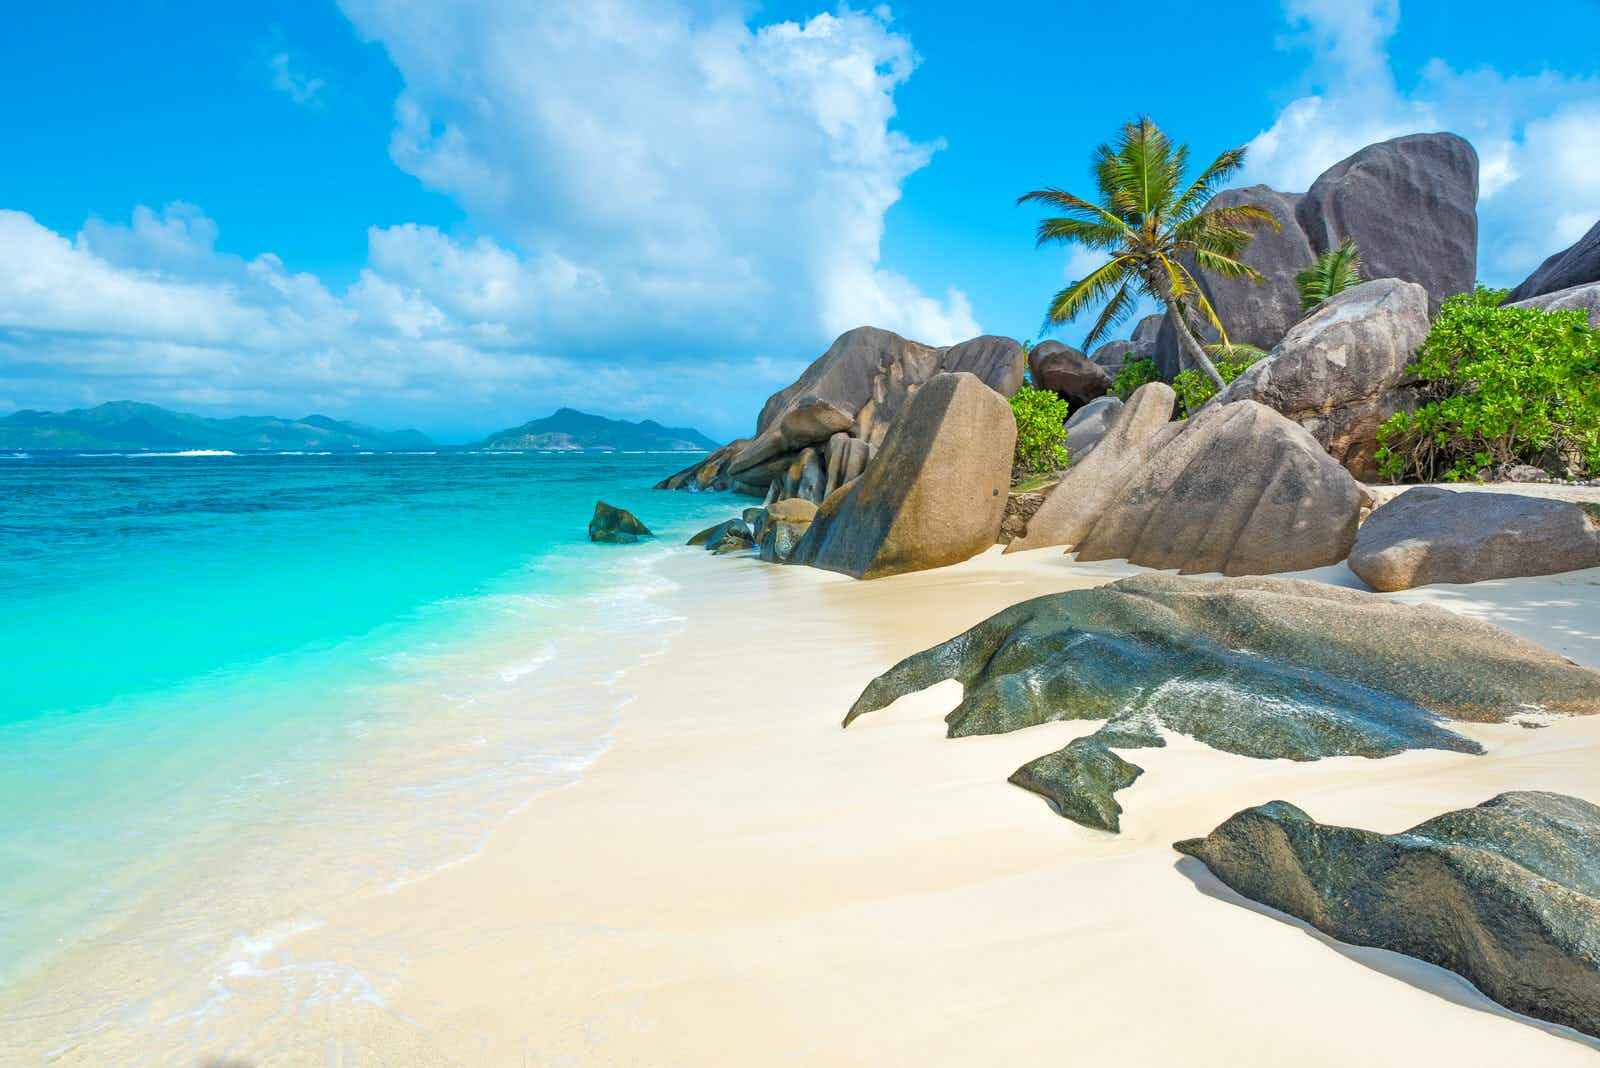 Treasure Islands The Natural Wonders Of The Seychelles